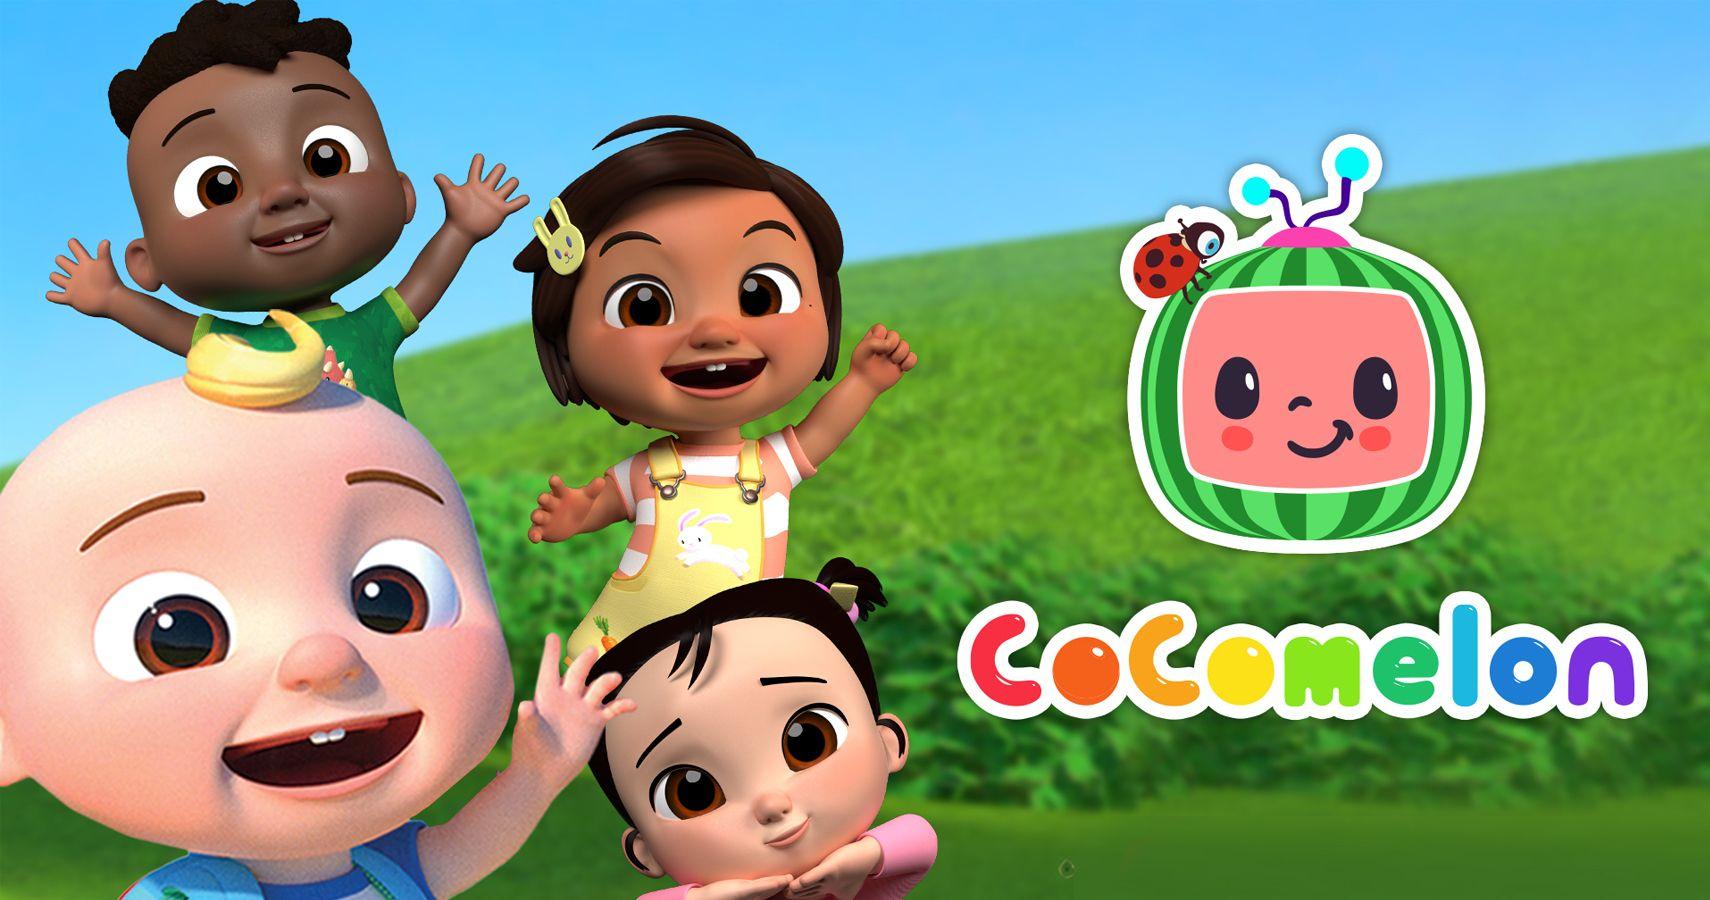 Cocomelon On Netflix For Kids | Moms.com